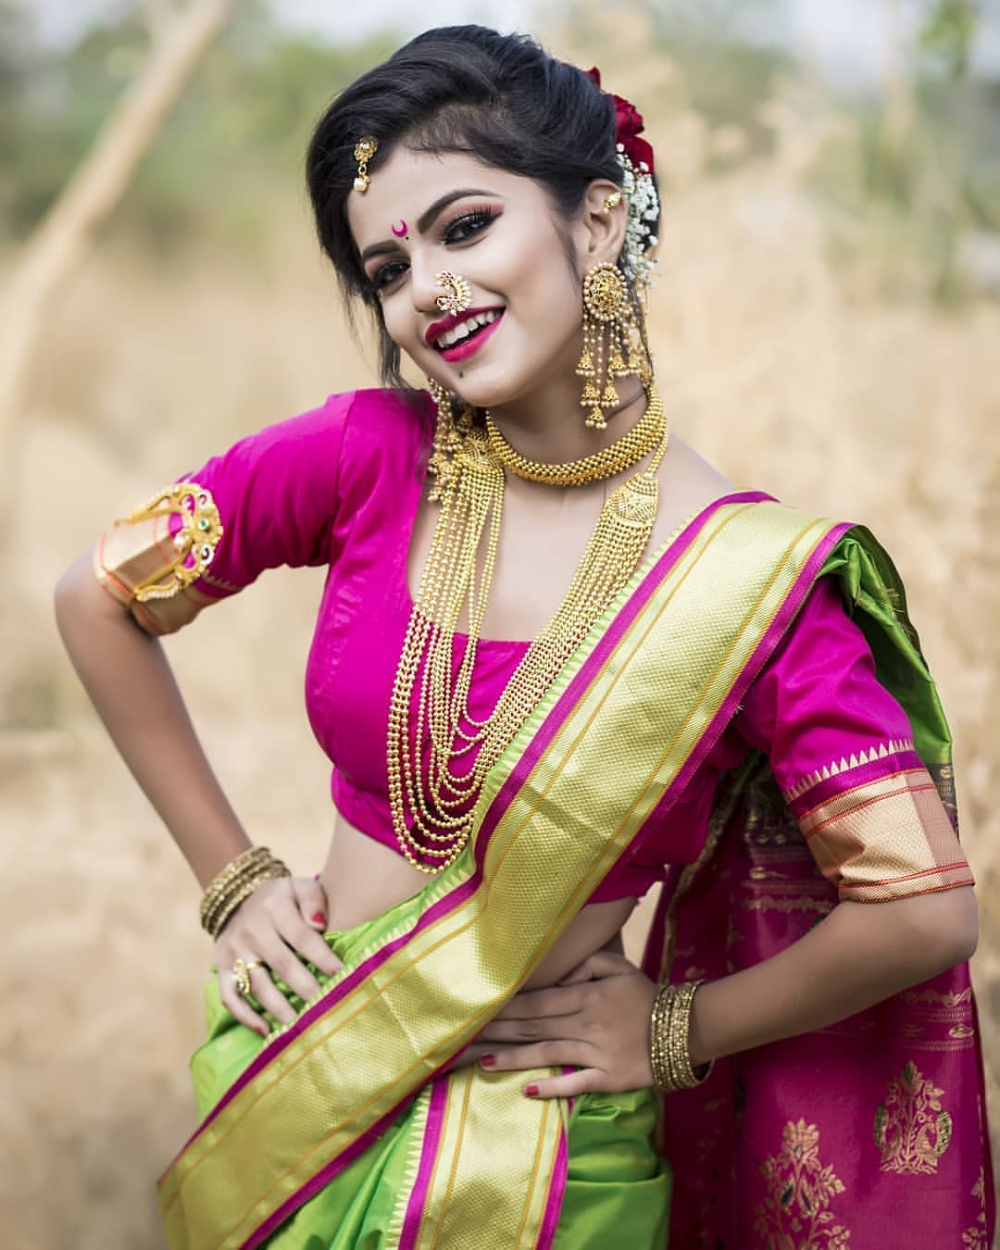 My likes image by Shivananda V Nandi in 2020 | Cute girl ...